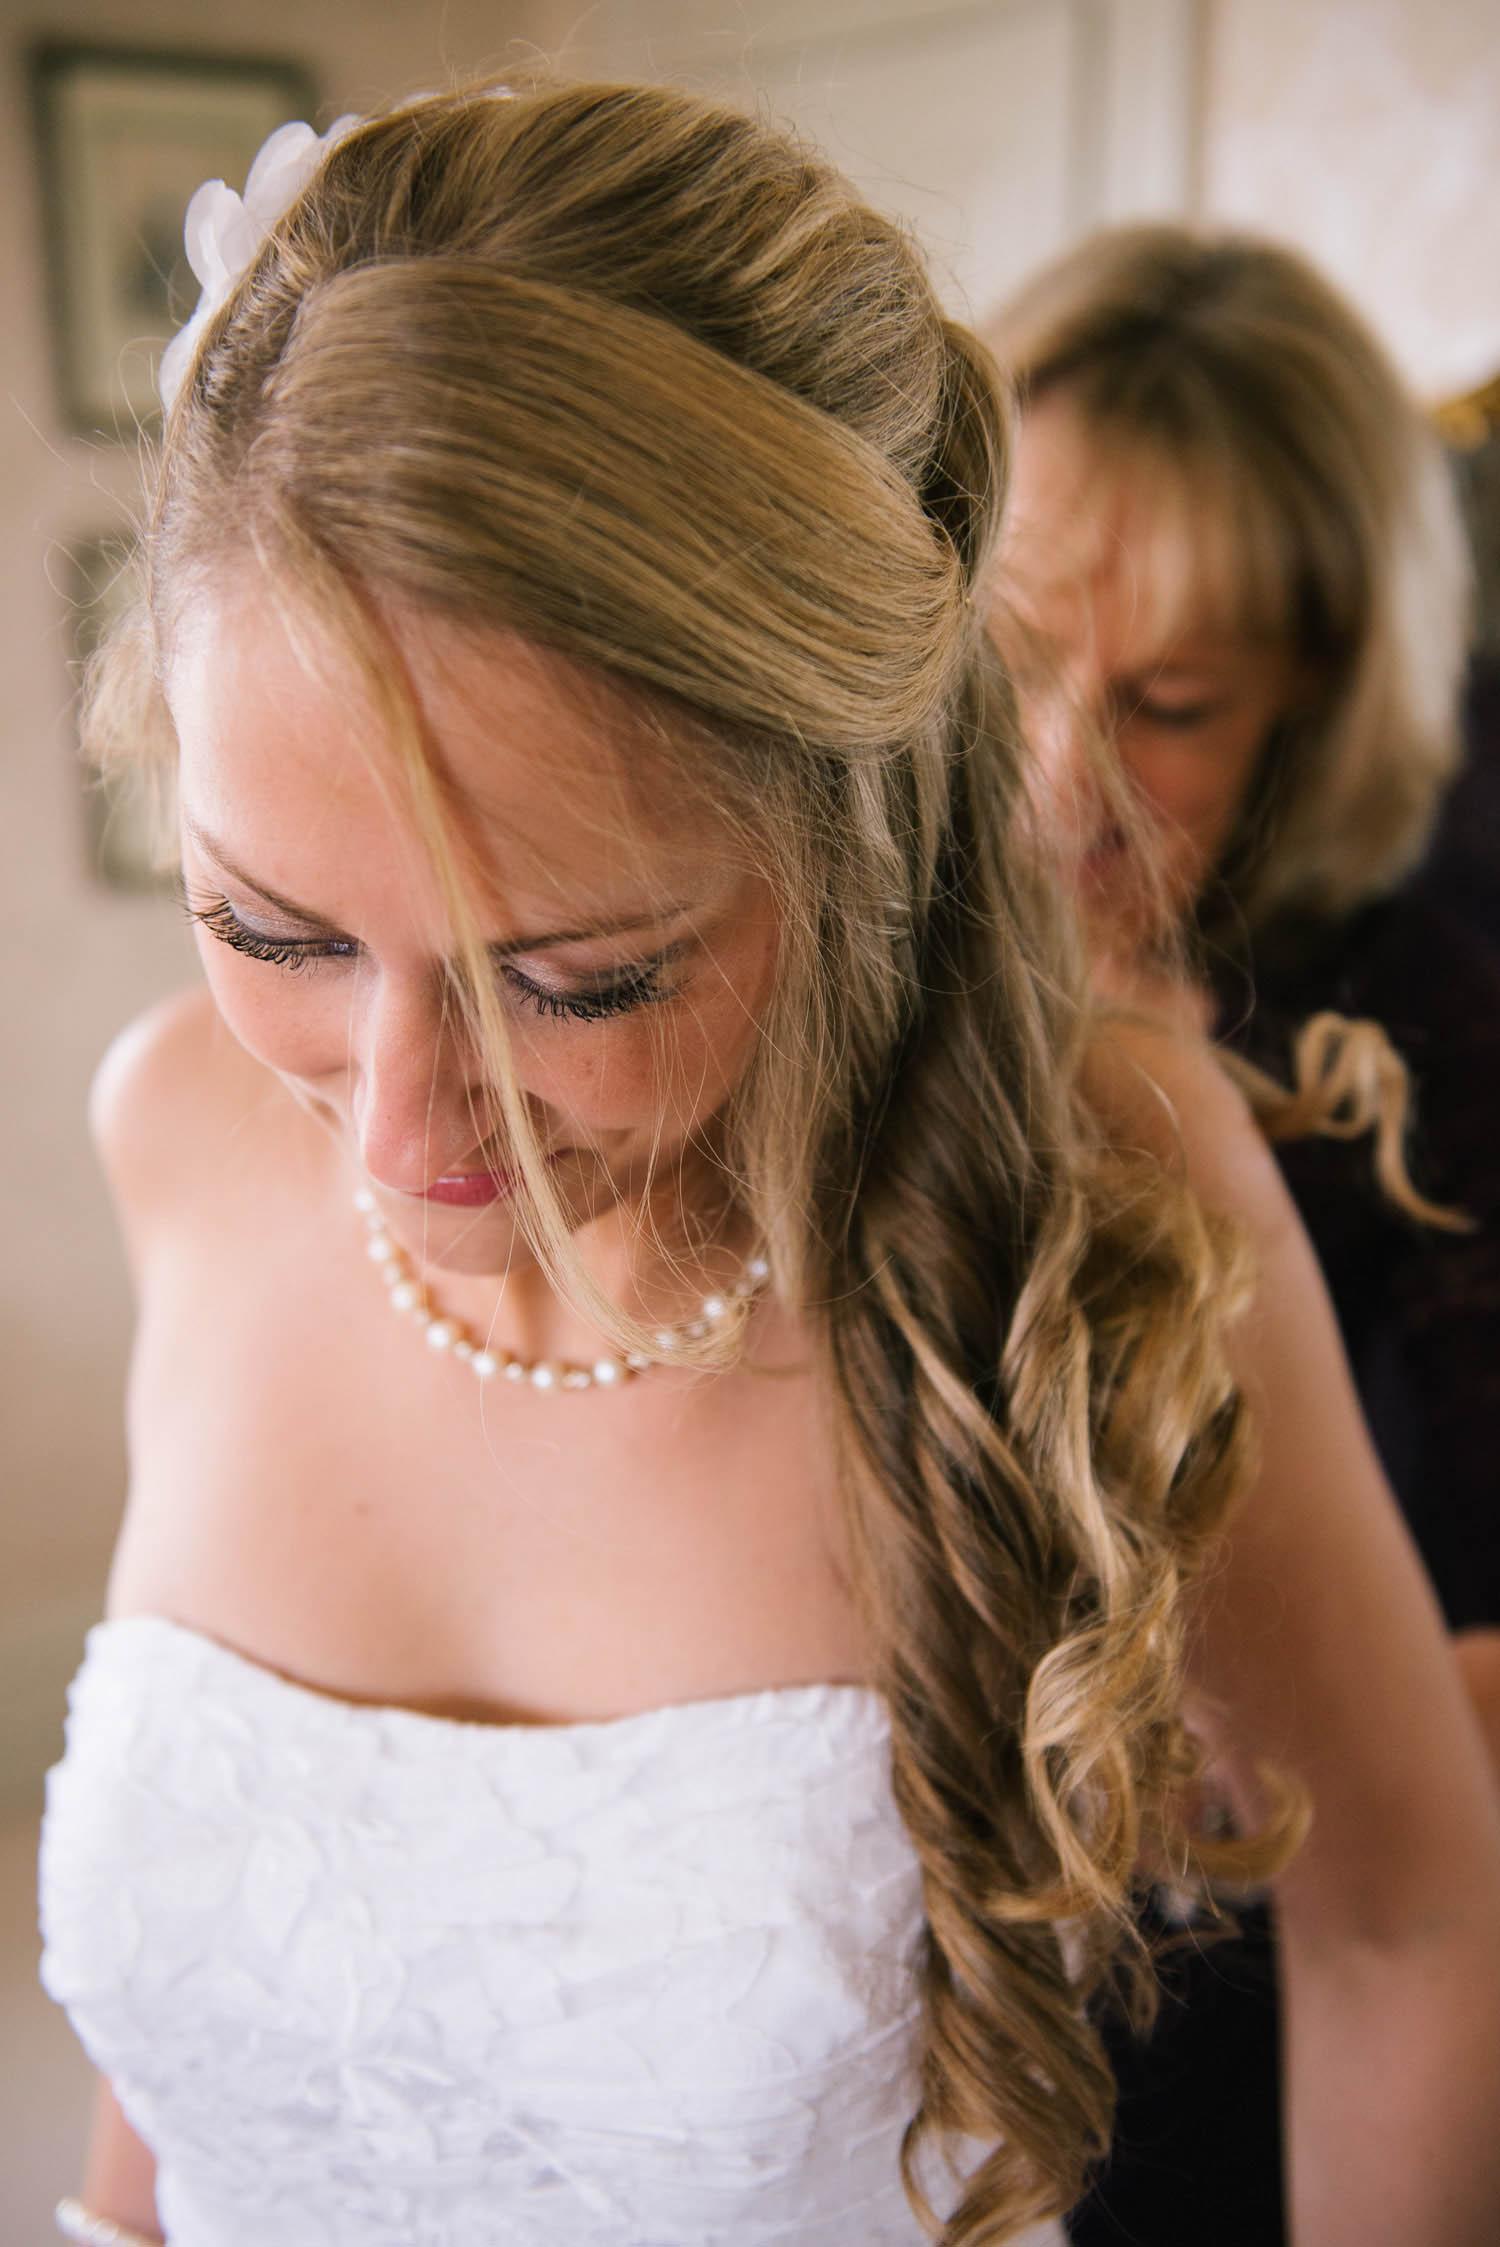 youngstrom-wedding-35.jpg